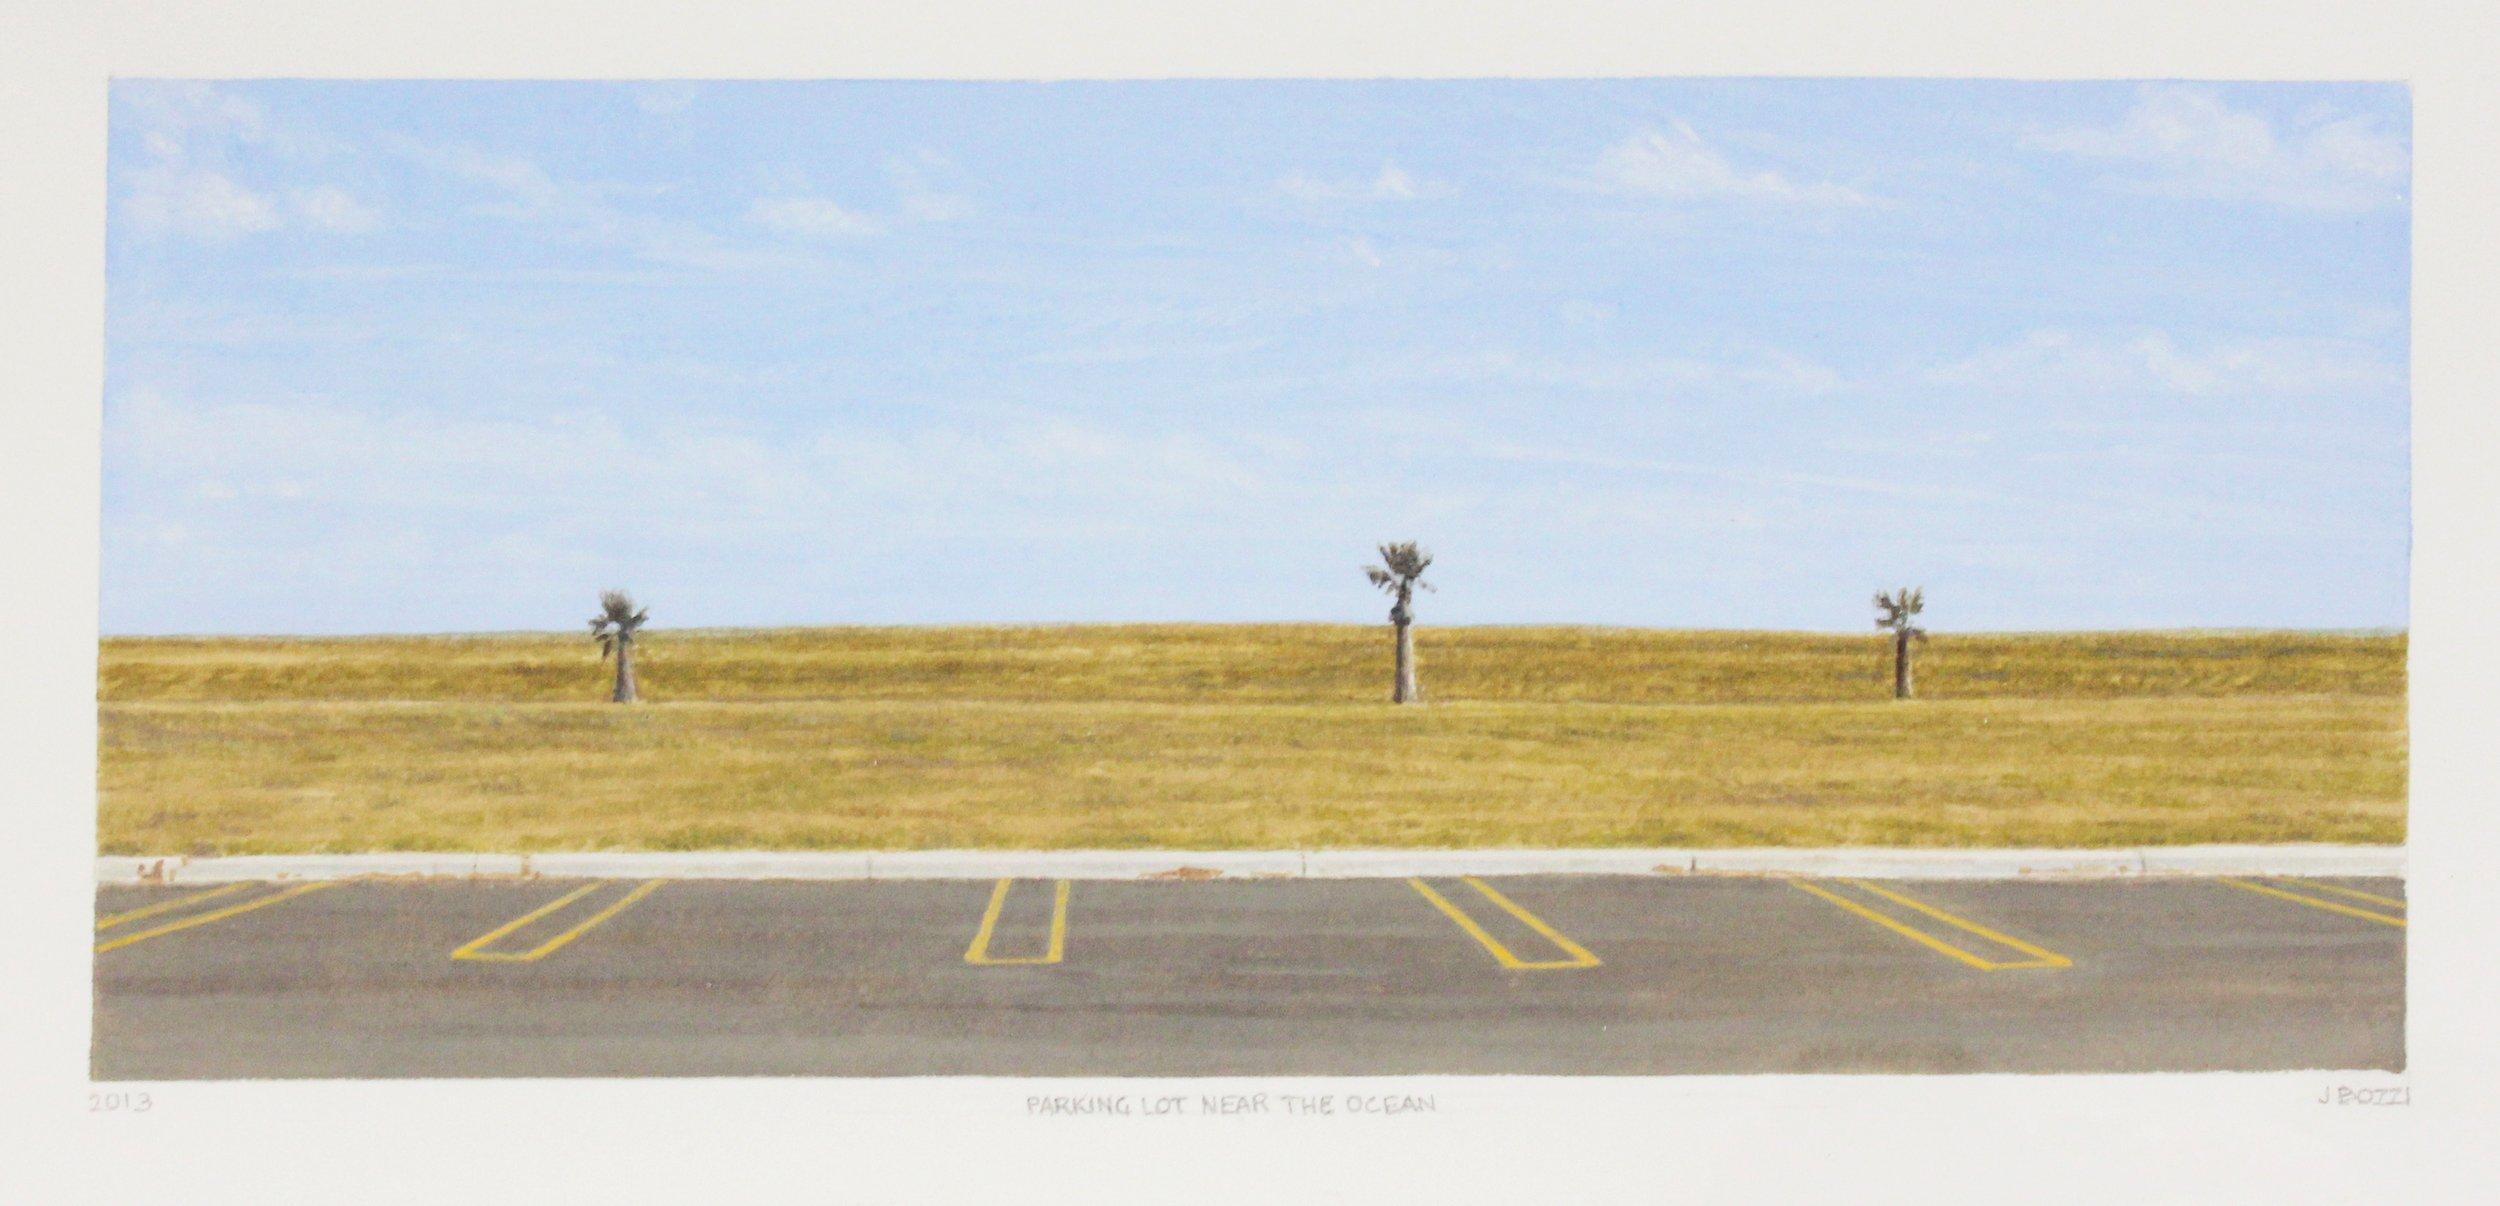 Julie Bozzi, Parking Lot by the Ocean